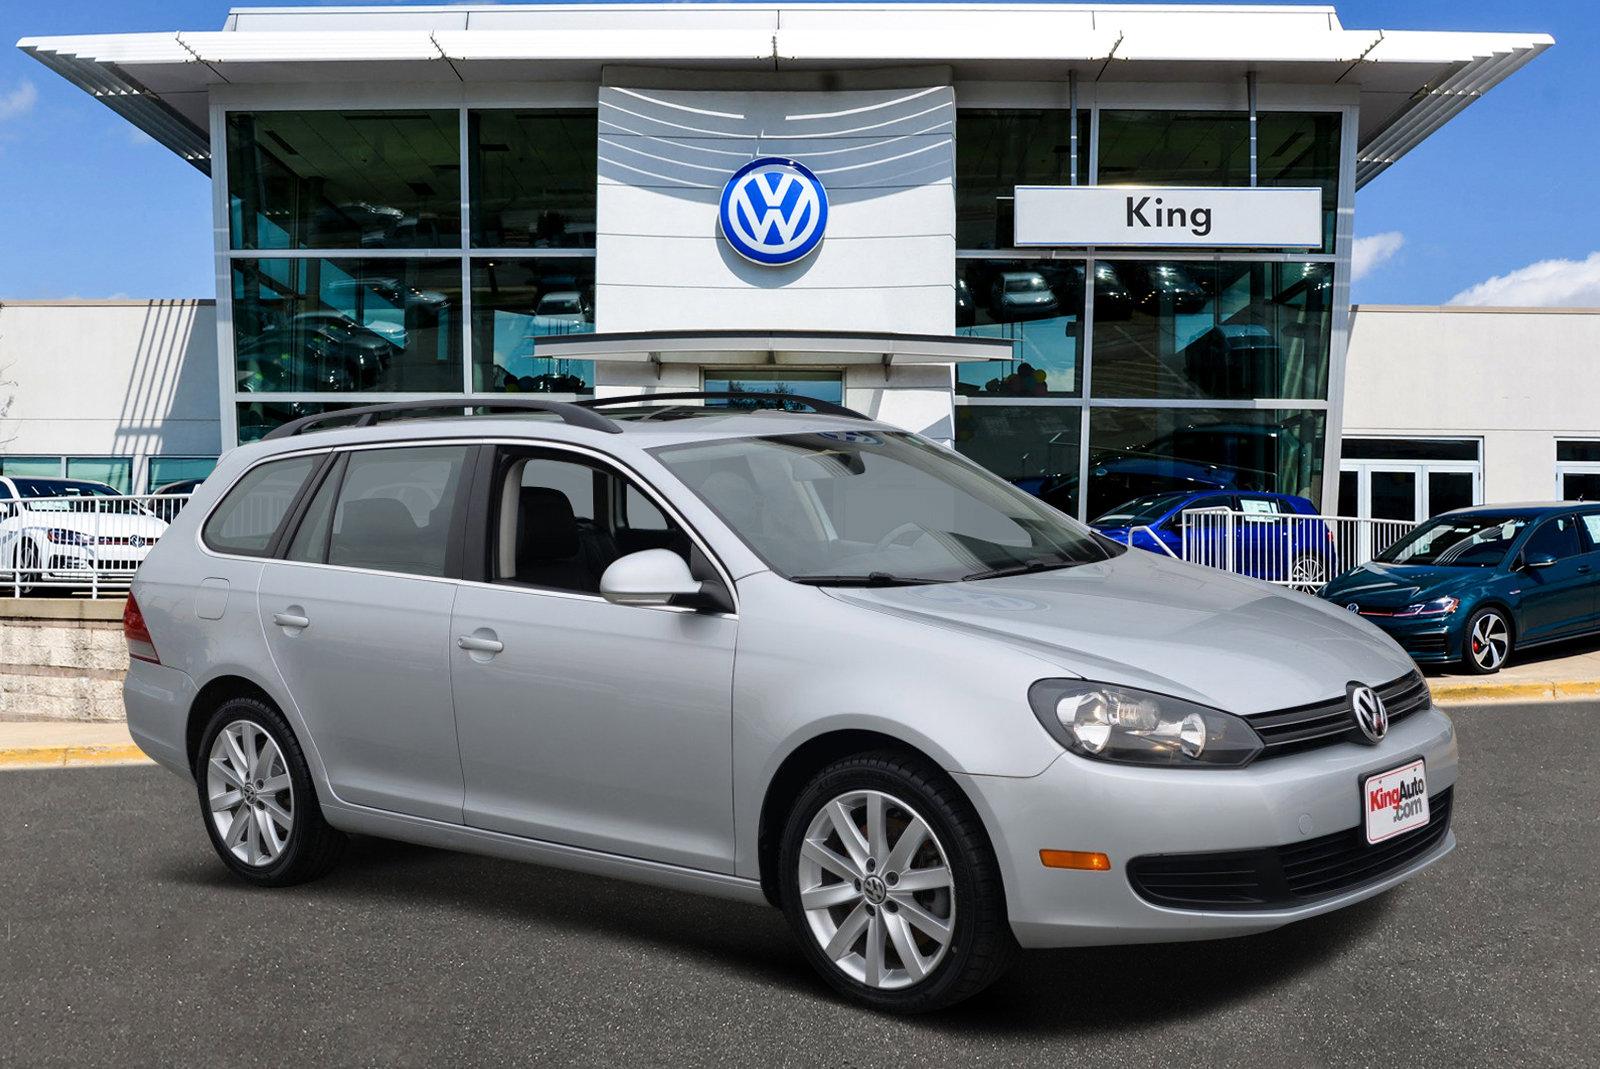 2011 Volkswagen Jetta TDI image